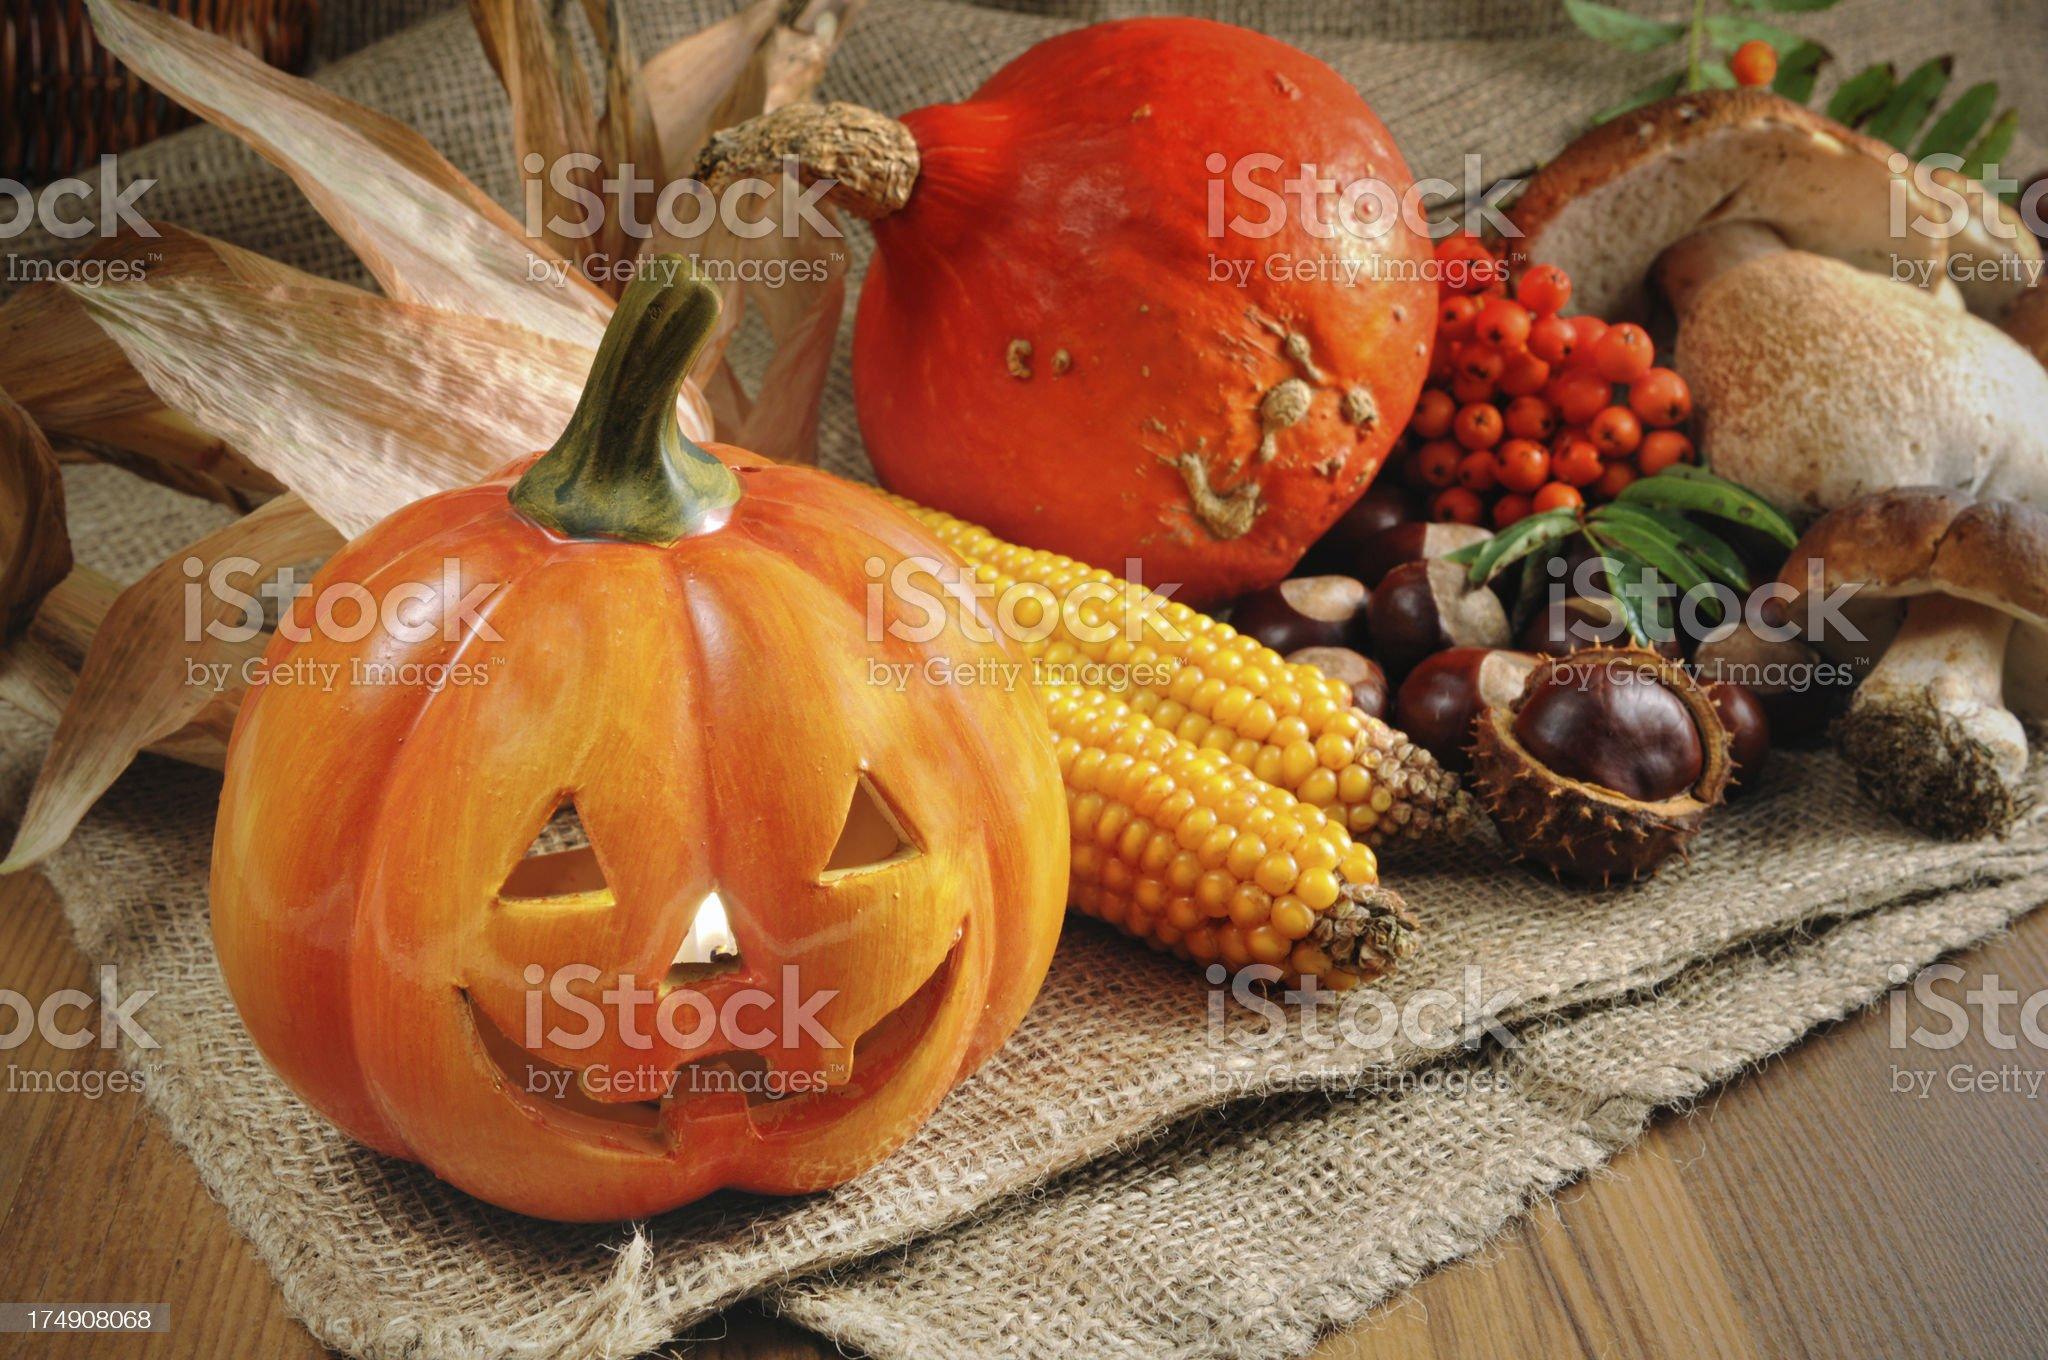 Red Hokkaido halloween pumpkin with chestnuts and mushroom royalty-free stock photo